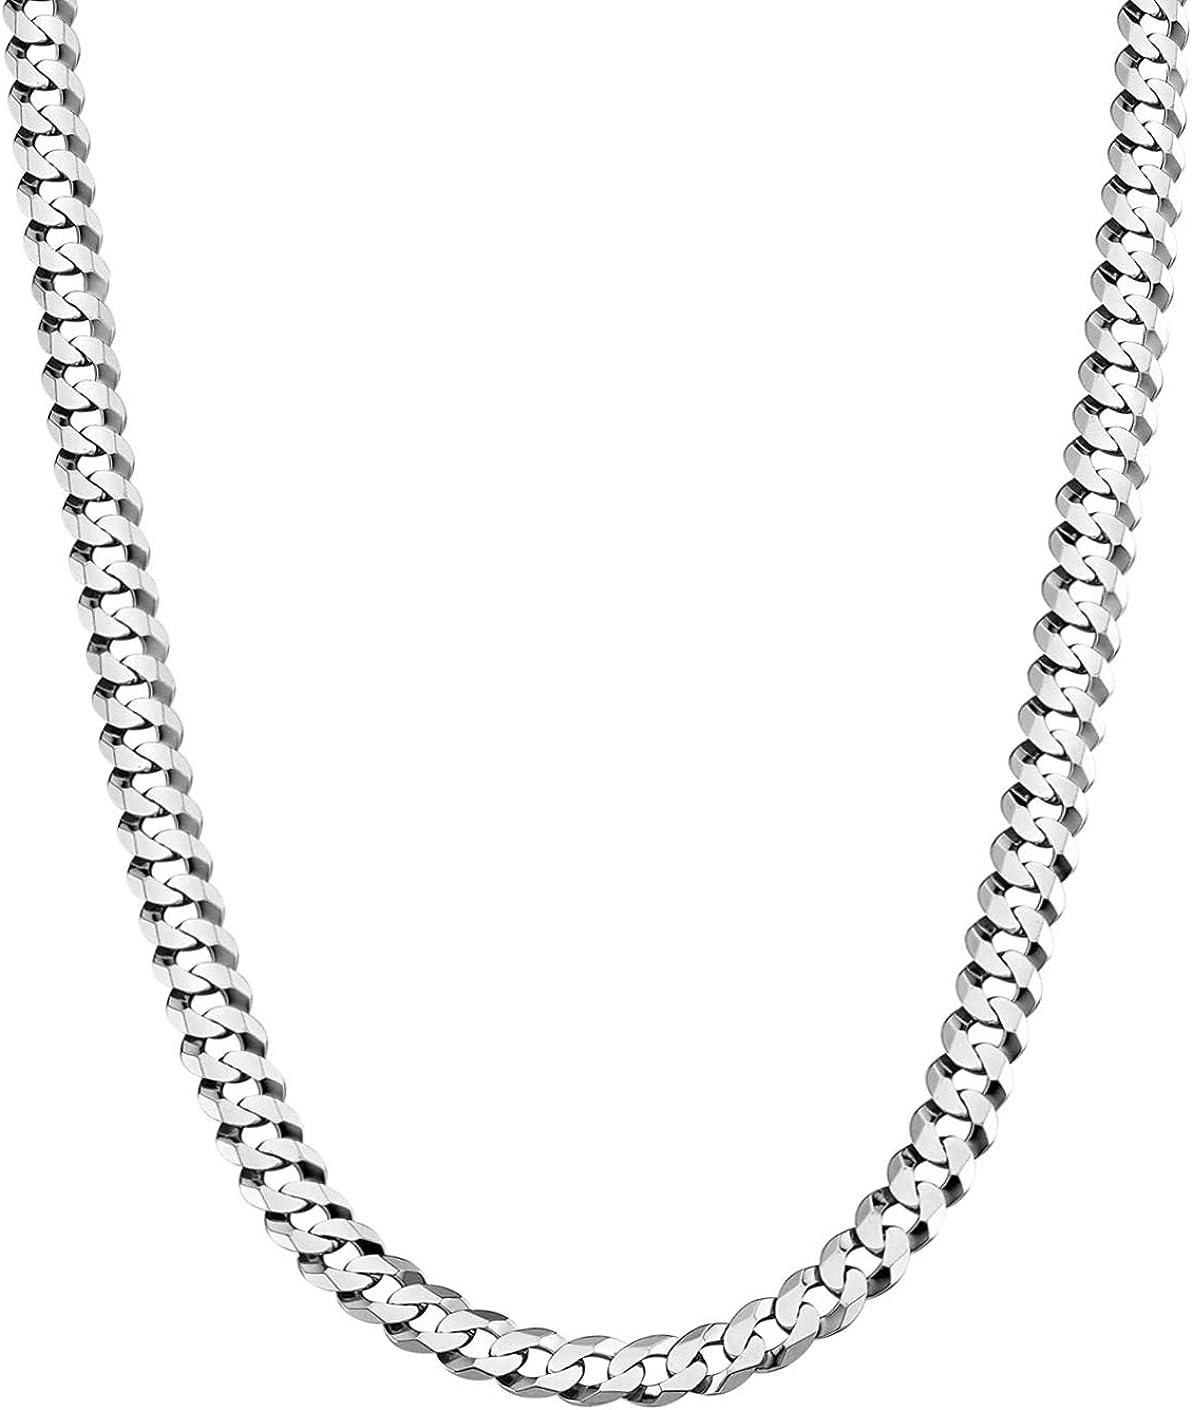 Savlano 925 Sterling Silver 5mm High quality free shipping Italian Ch Solid Curb Link Cuban